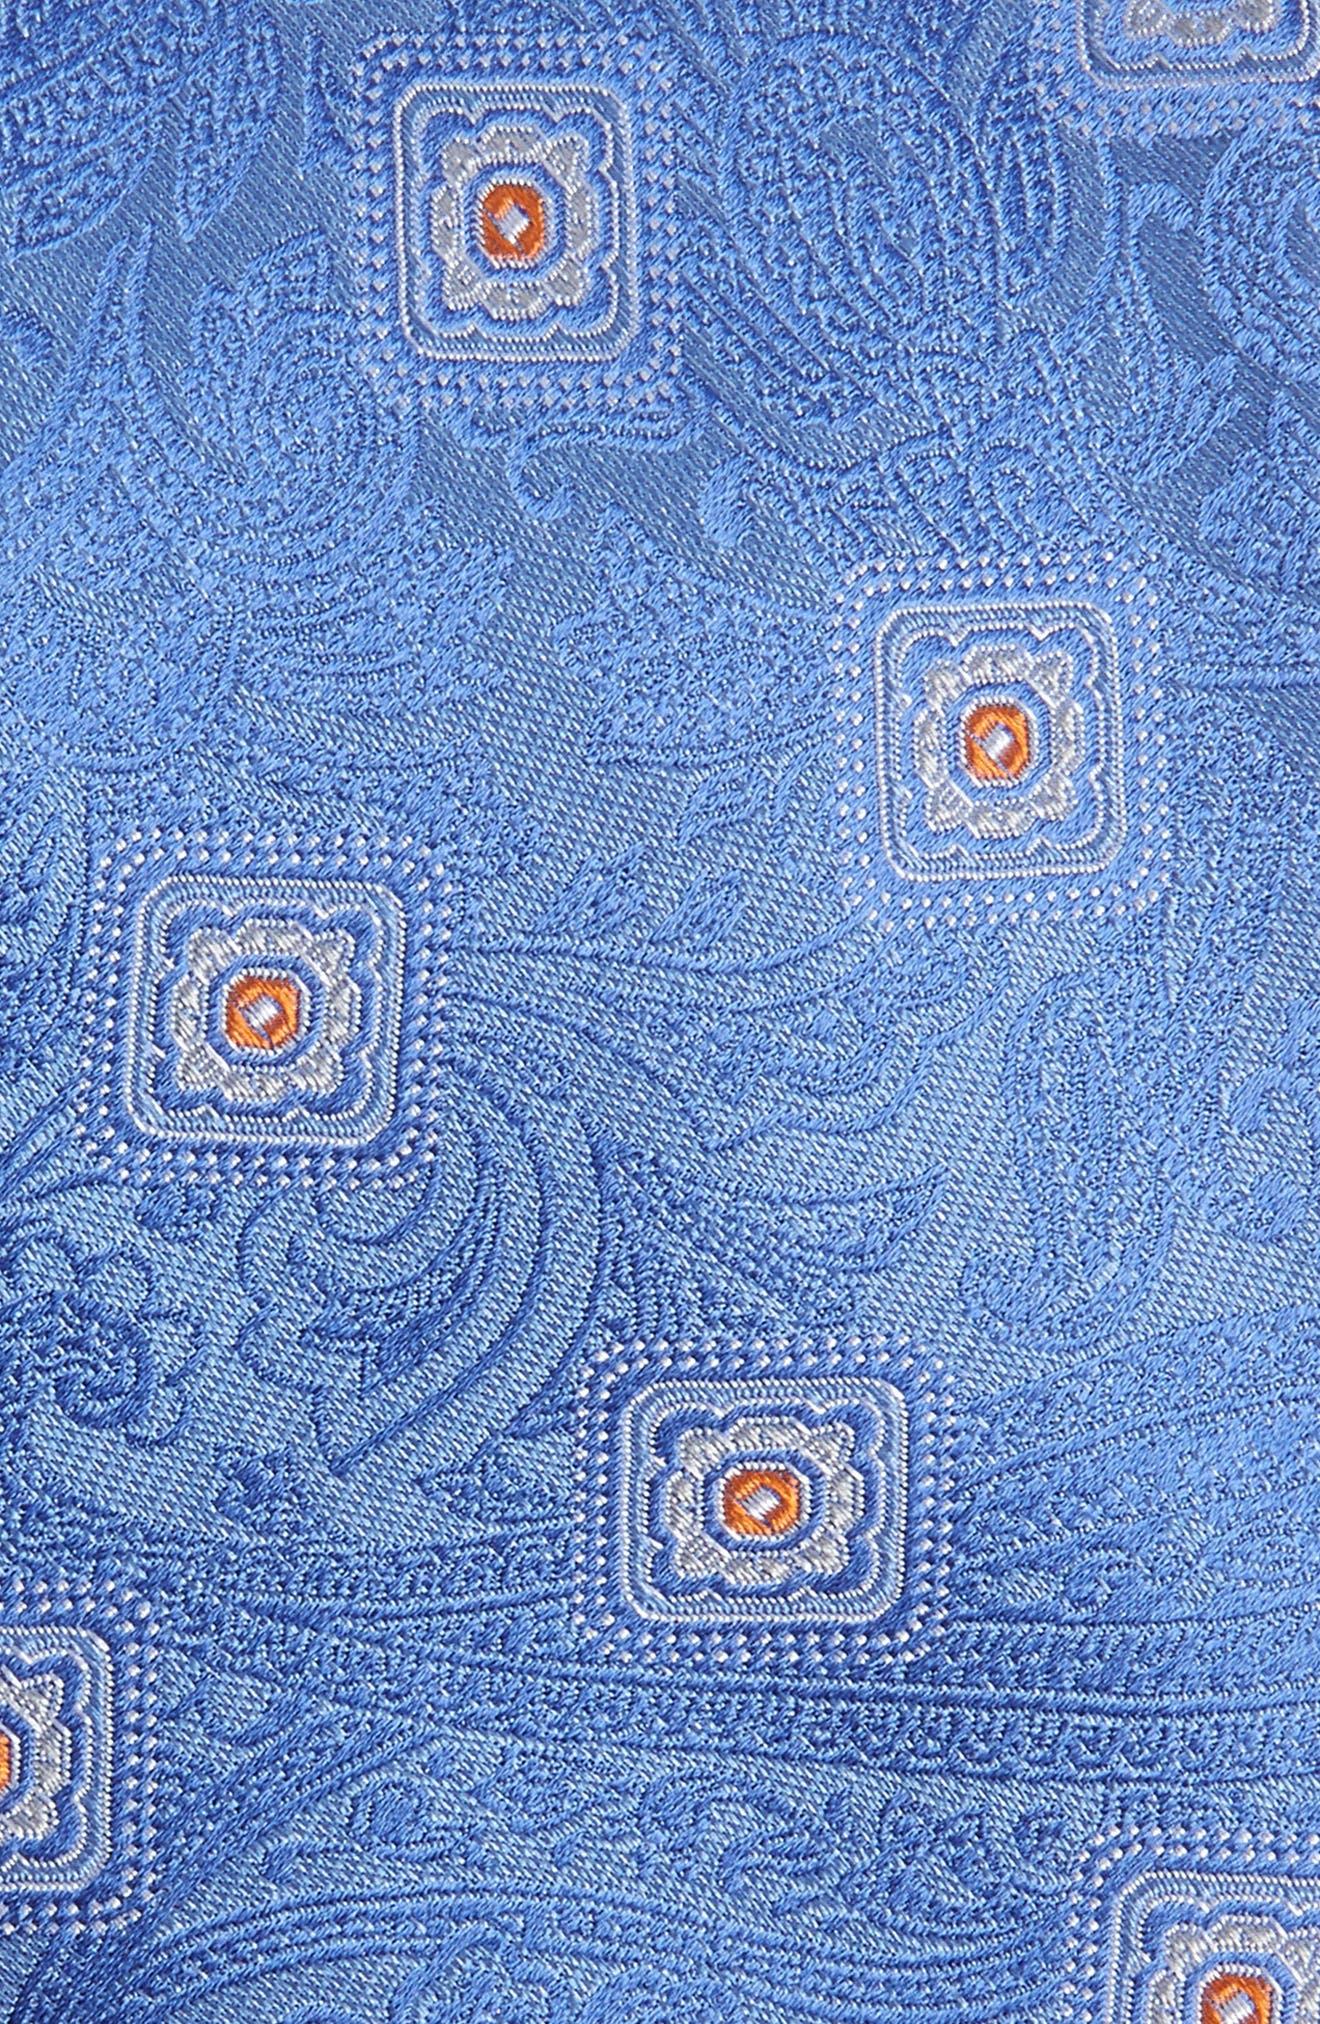 Baird Medallion Silk Tie,                             Alternate thumbnail 2, color,                             BLUE